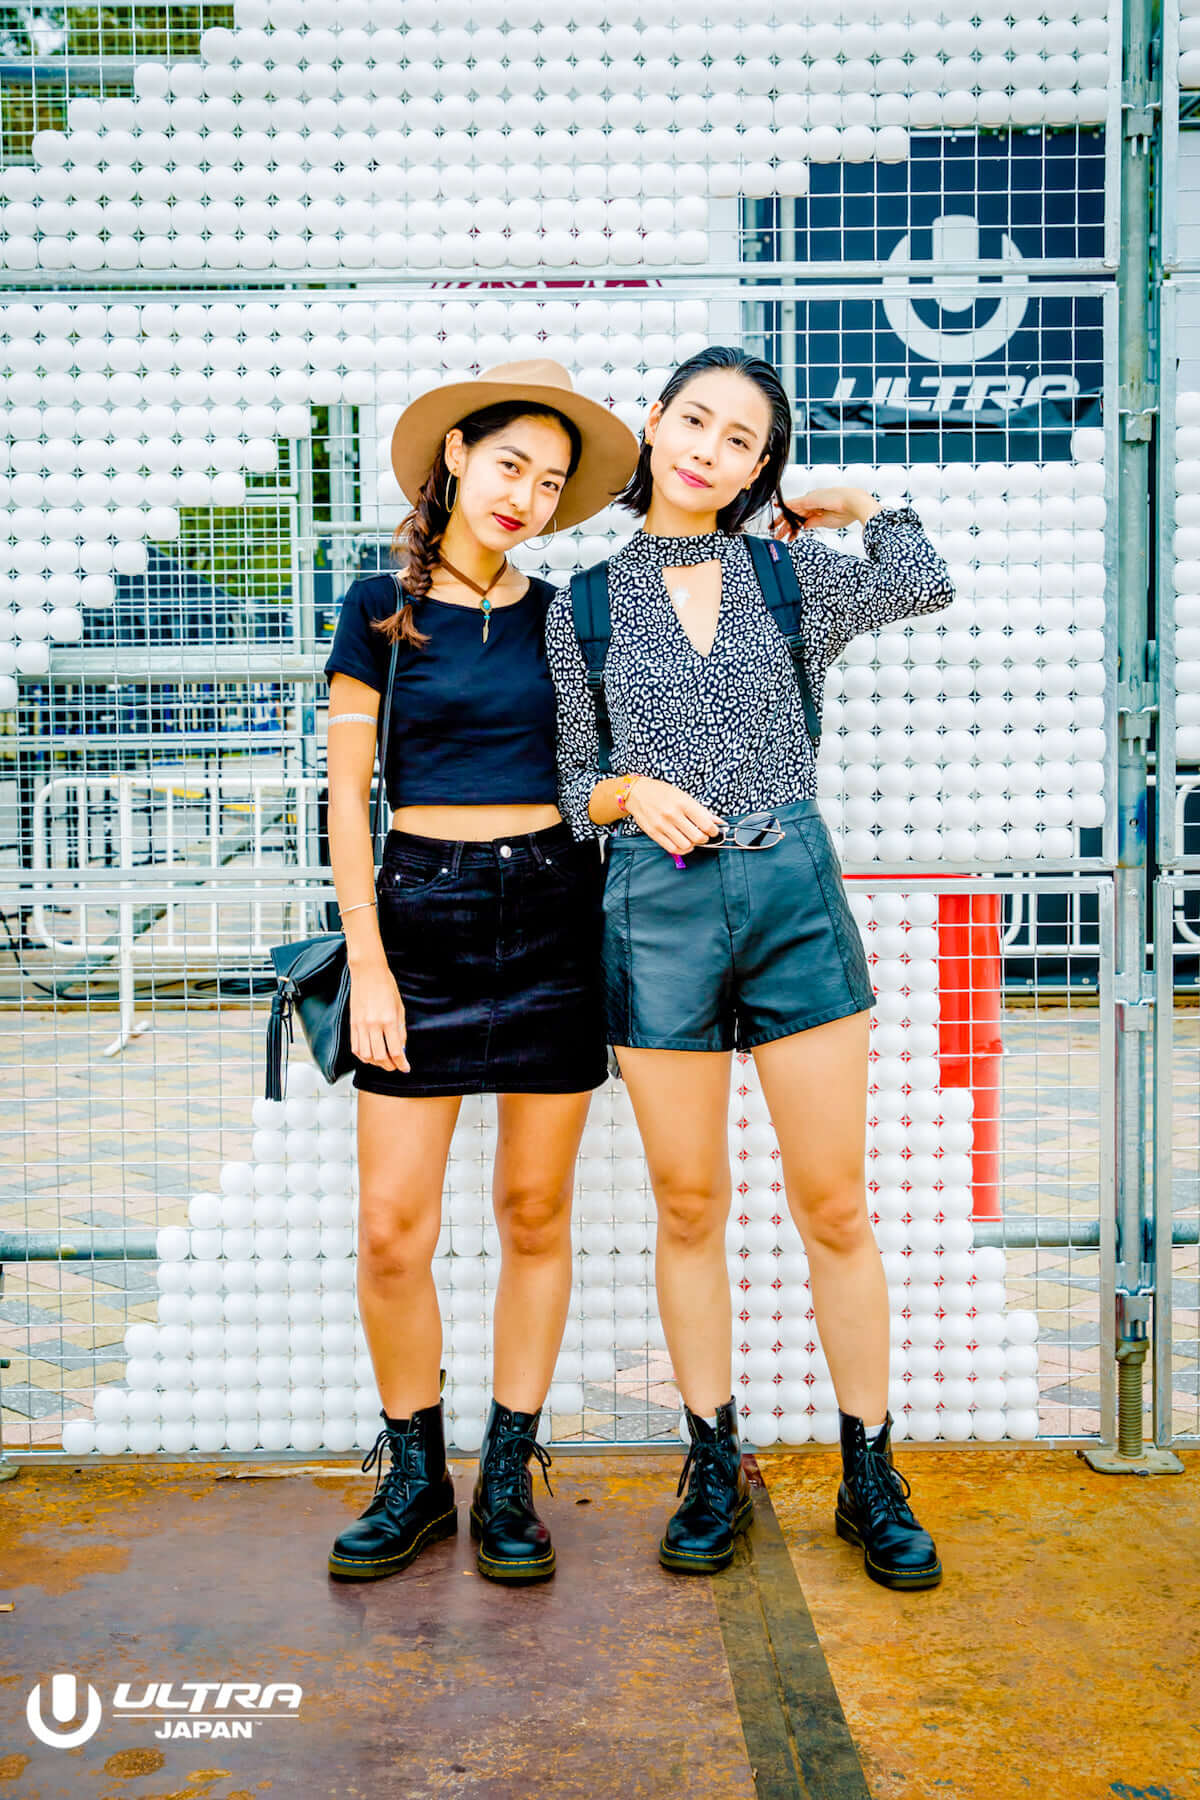 ULTRA JAPAN 2018公式ファッションスナップ到着!今年のトレンドはリンクコーデ? music180918_ultrajapan2018_1_12-1200x1800